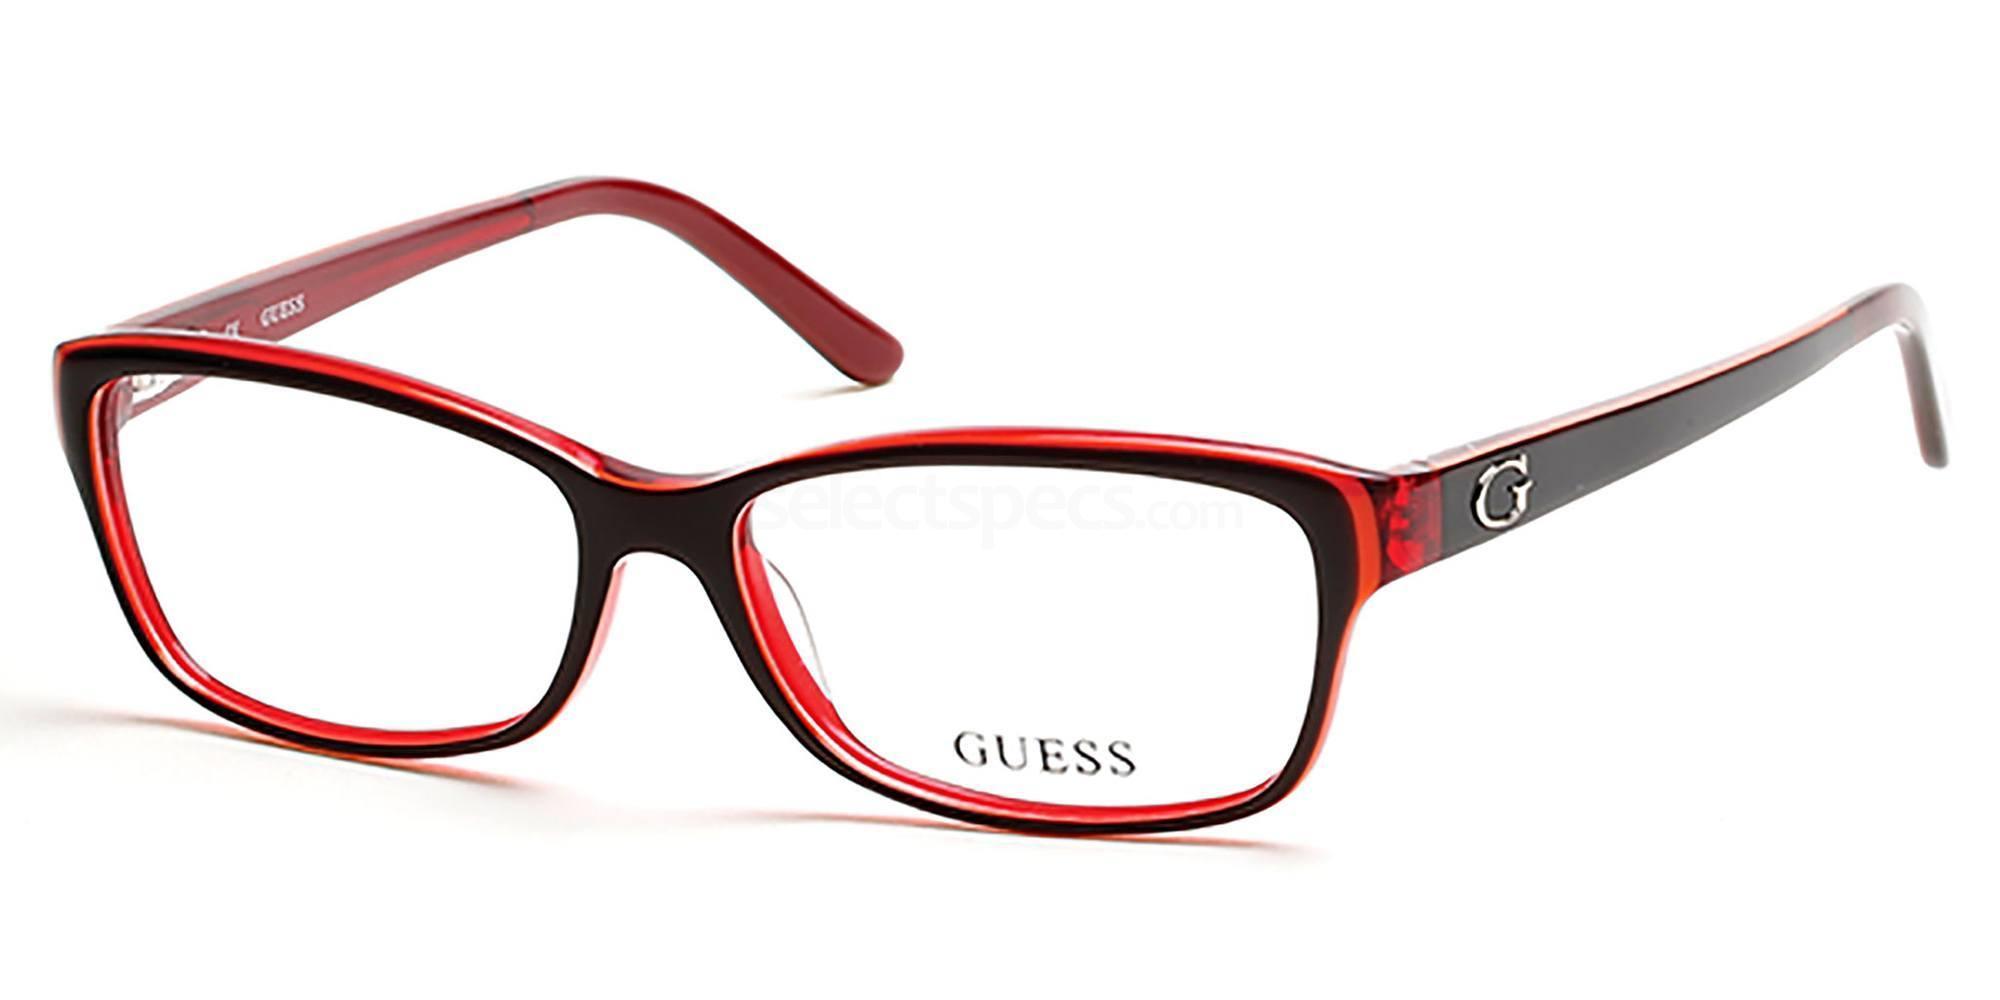 070 GU2542 Glasses, Guess